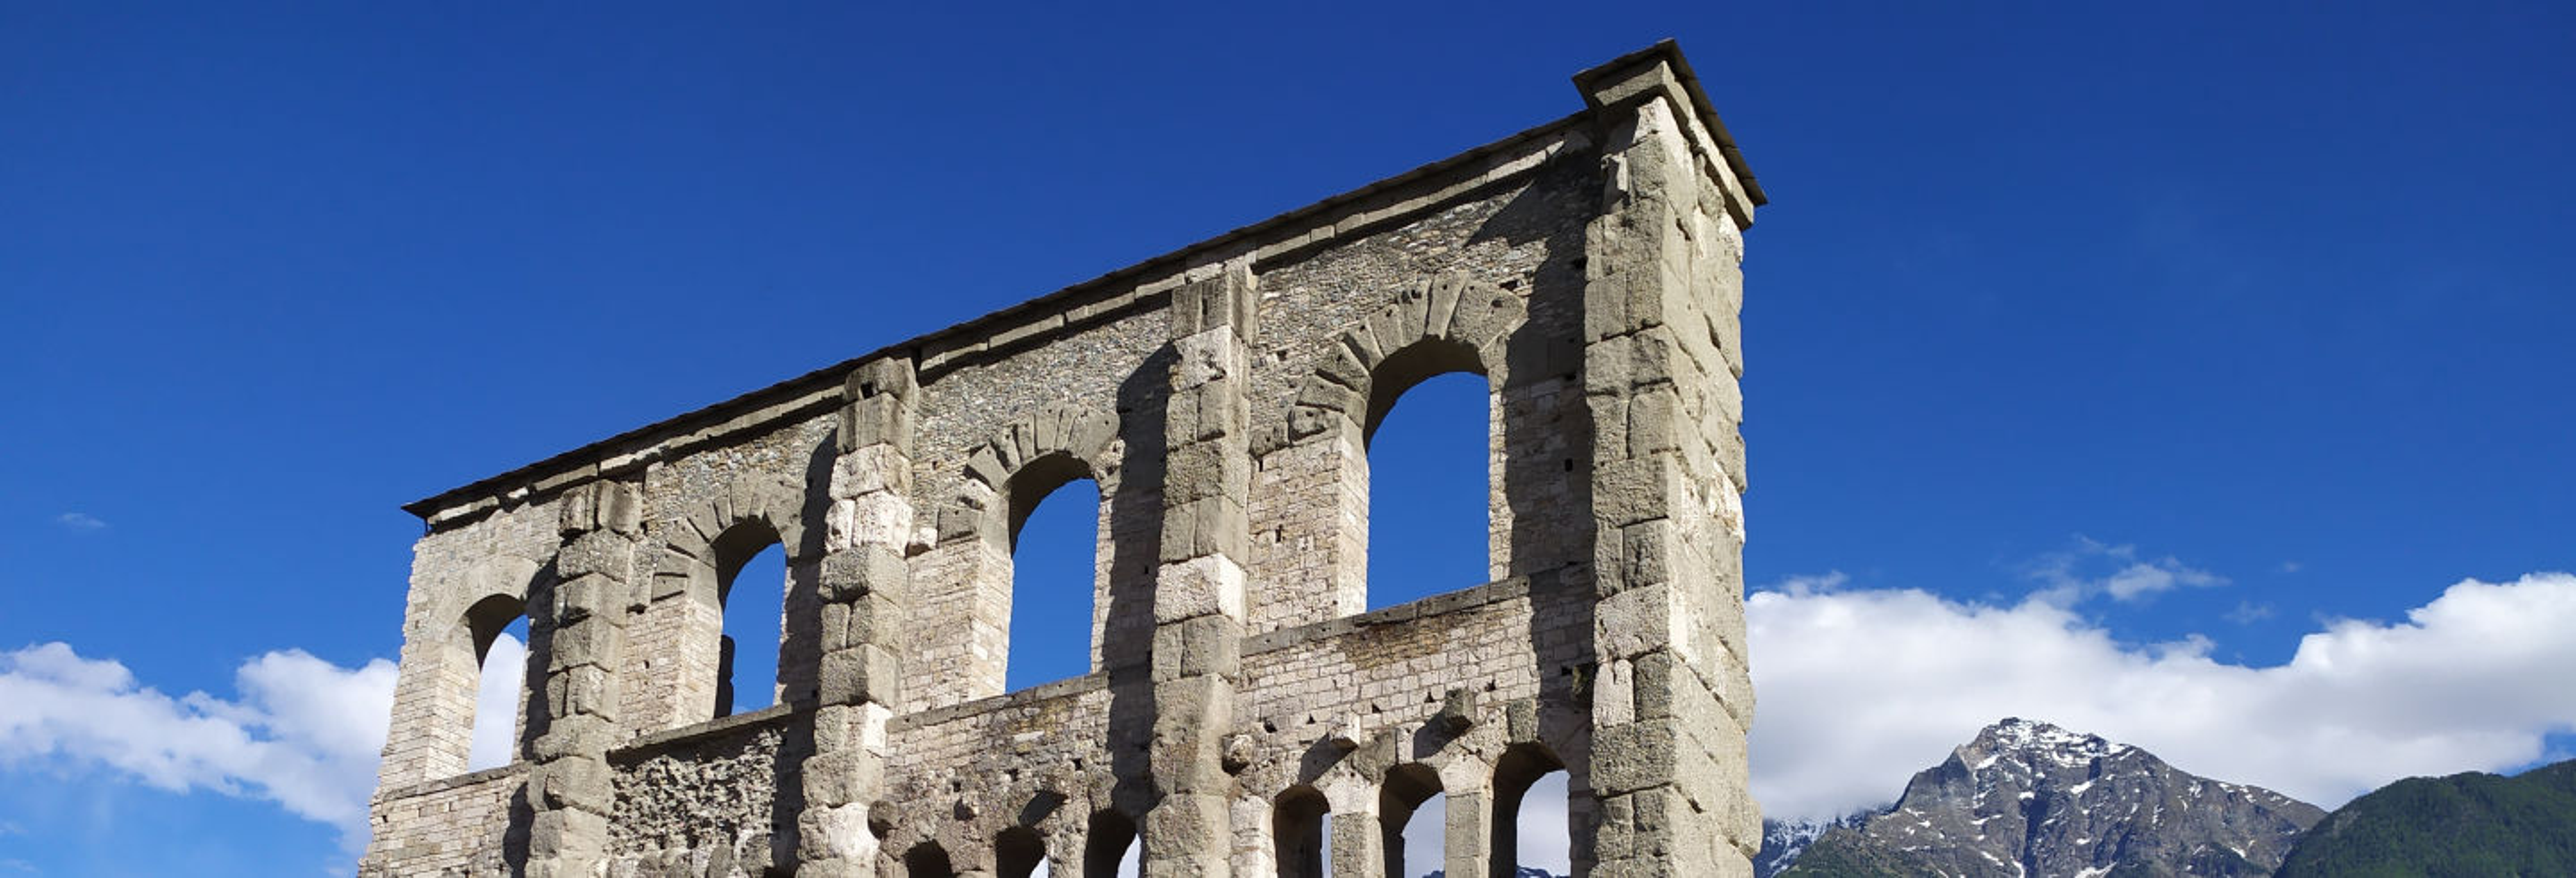 Tour dell'Aosta romana e medievale